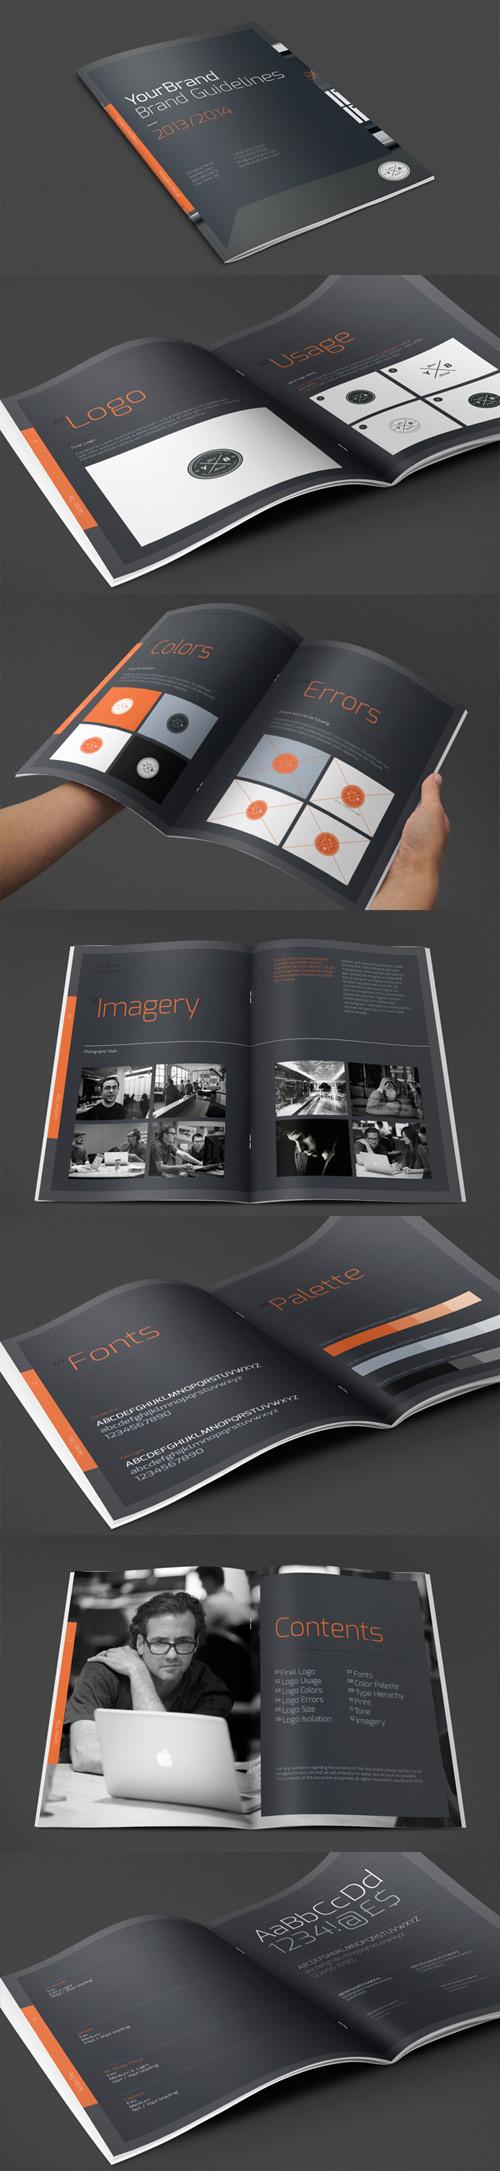 Brand Guidelines Brochure Design